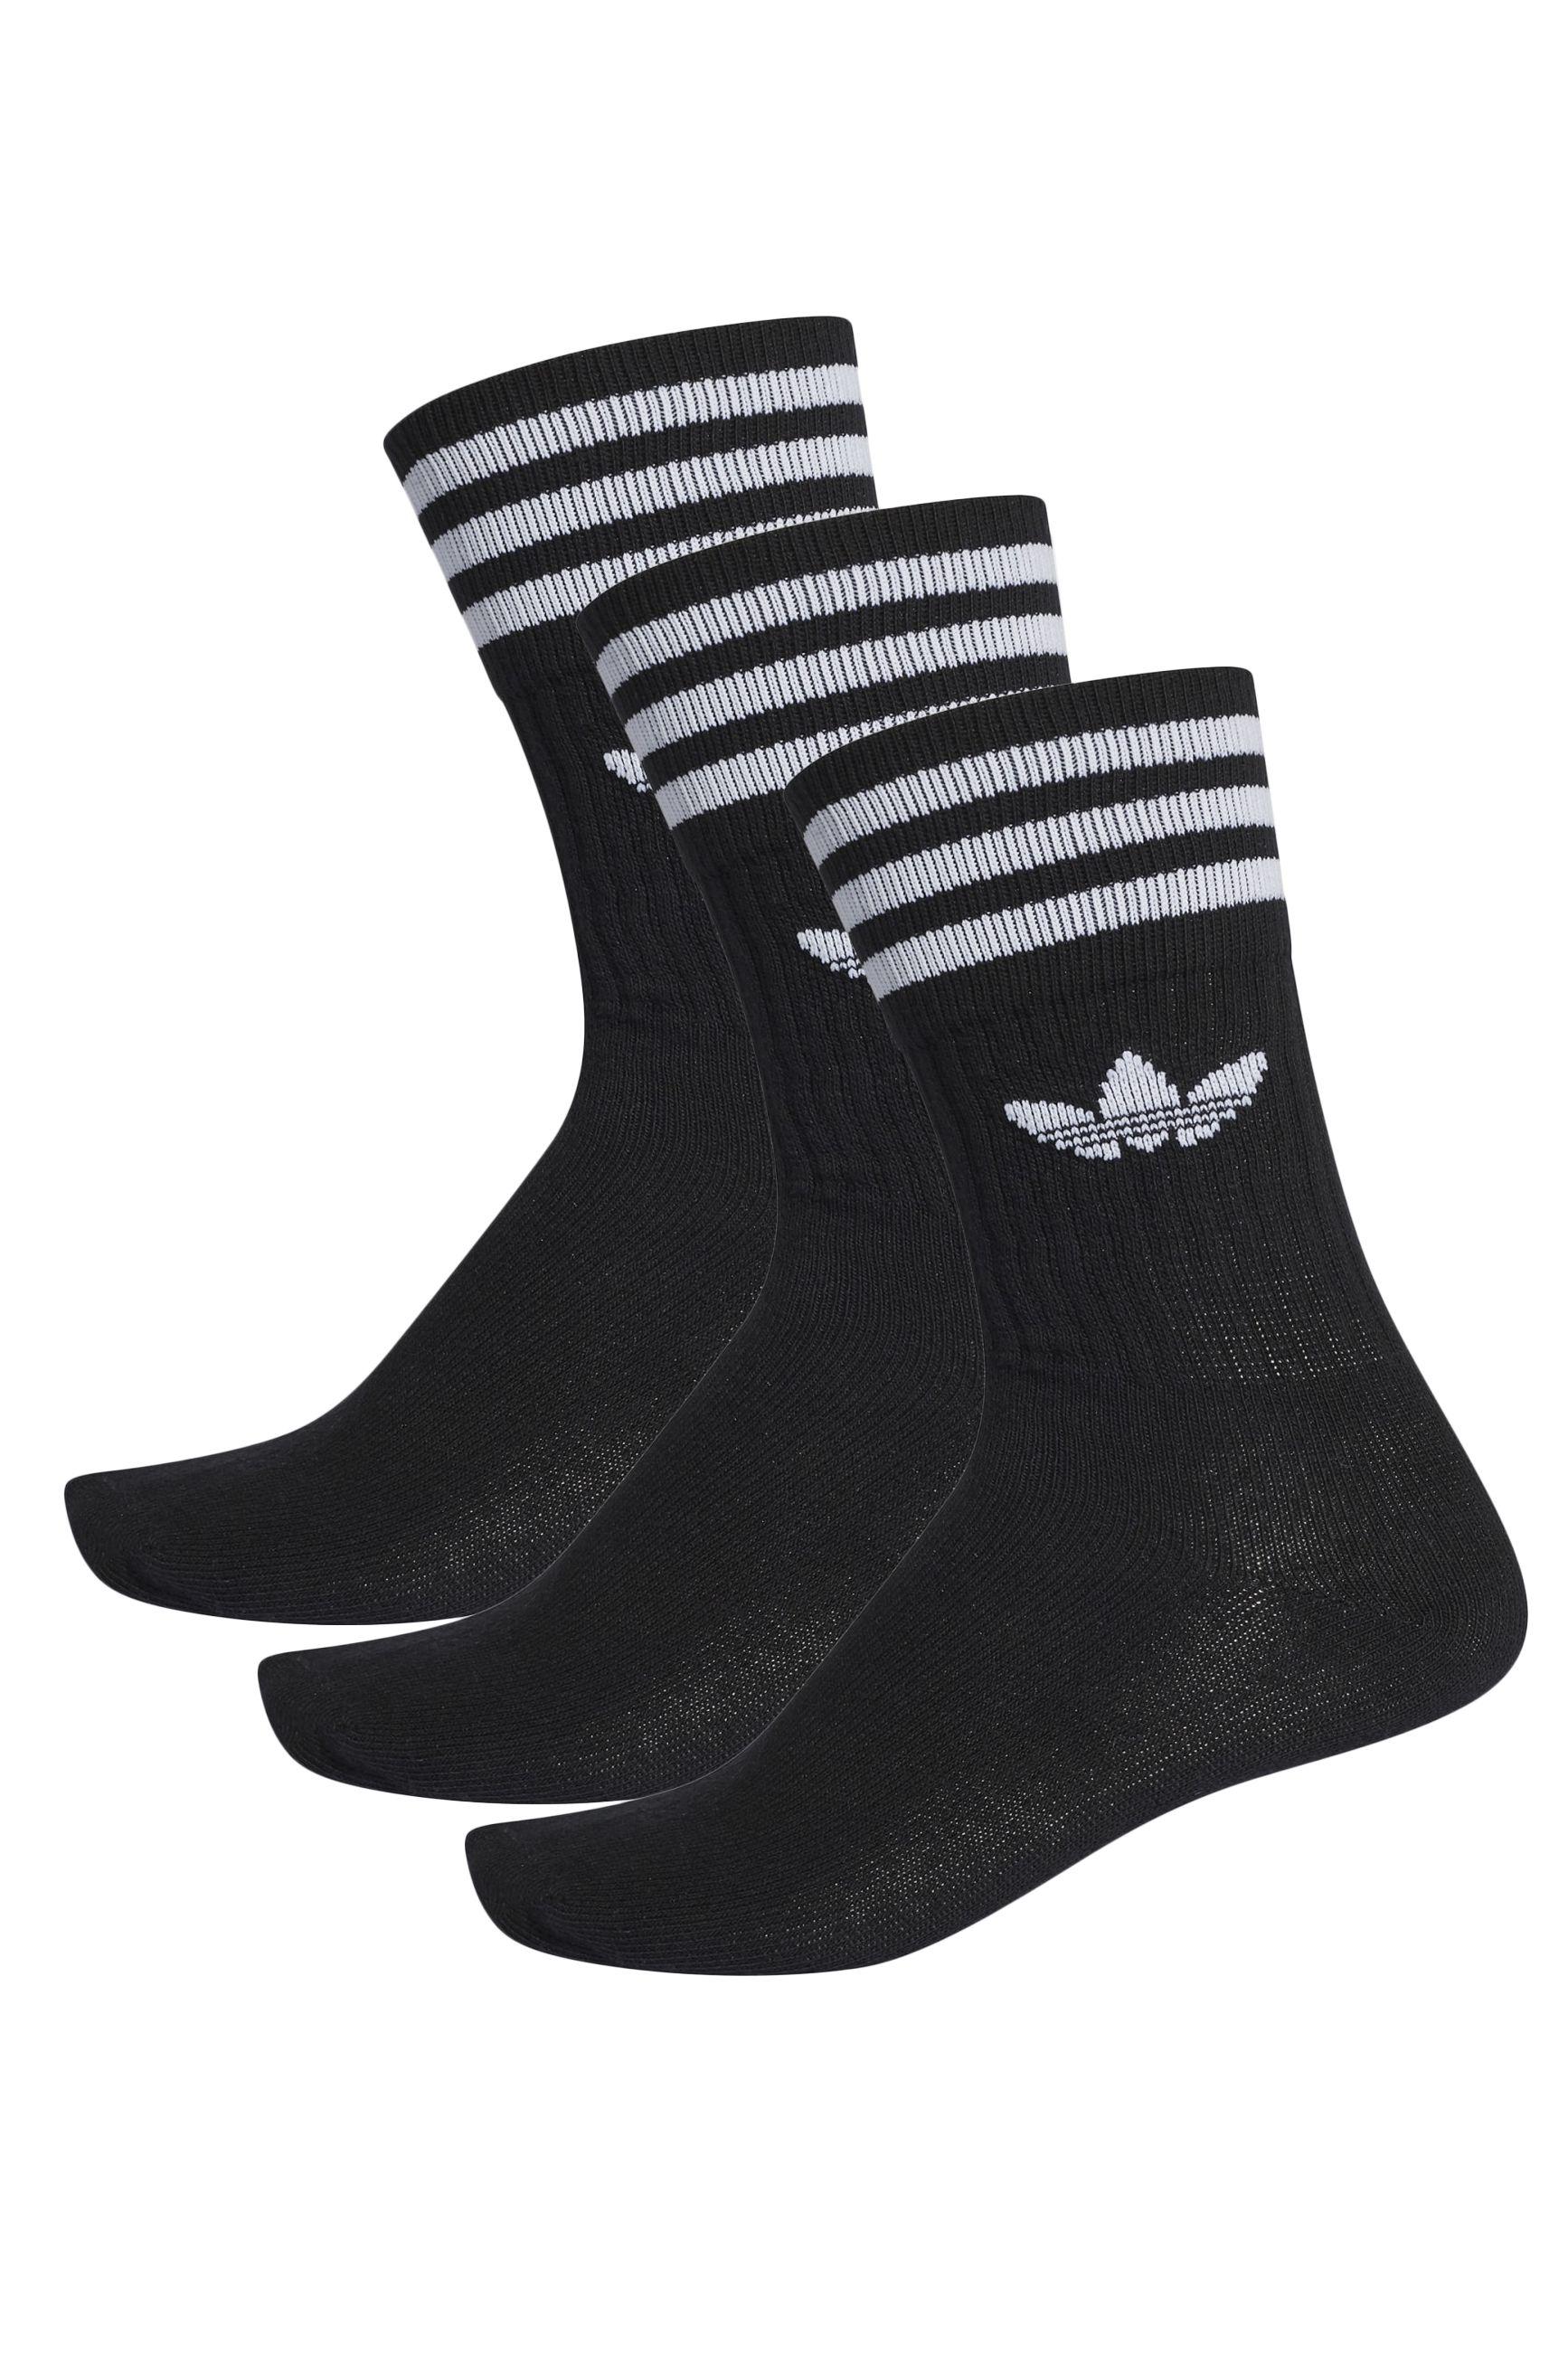 Meias Adidas SOLID CREW SOCK Black/White